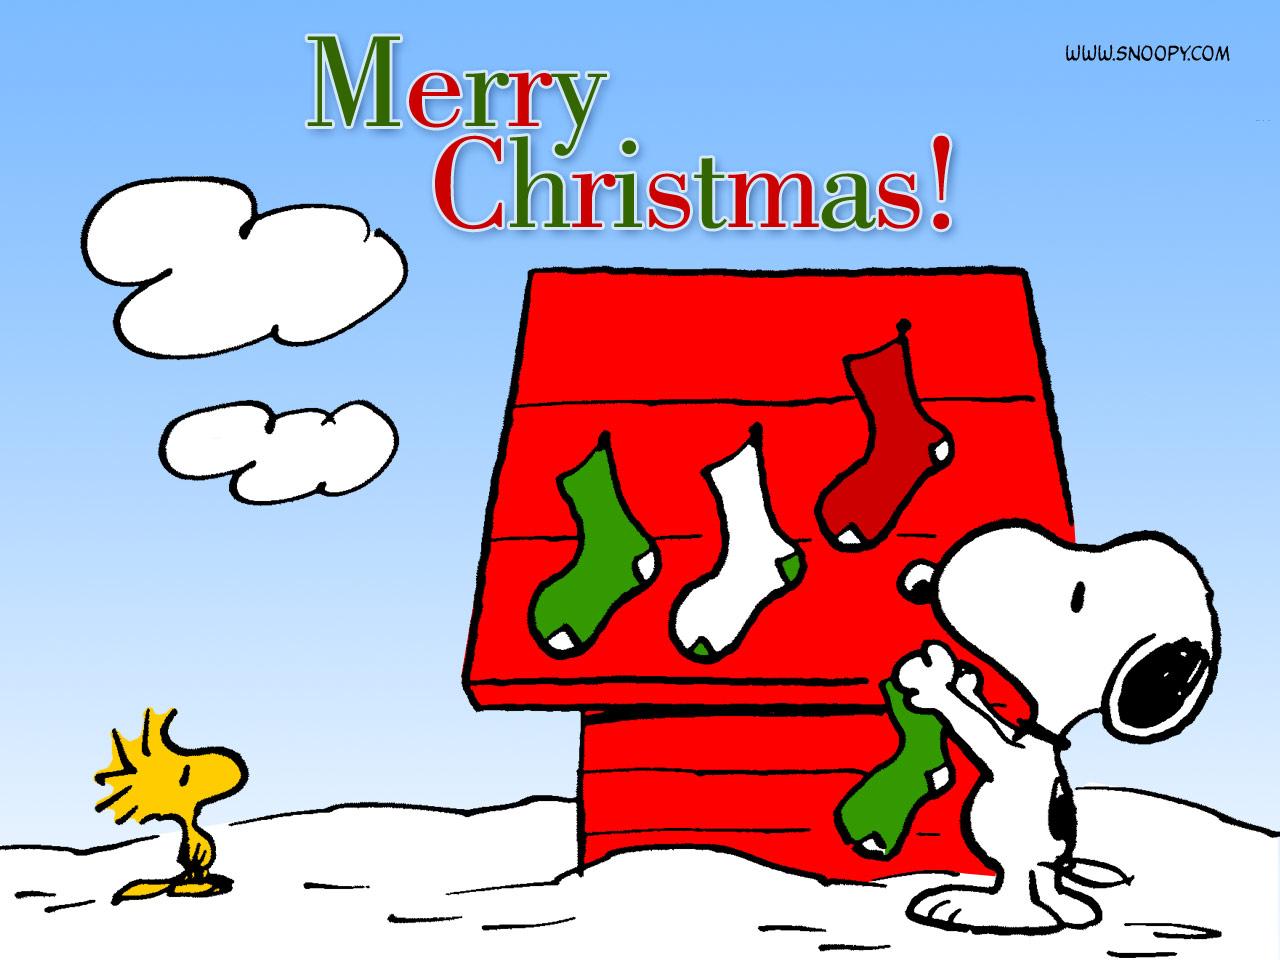 A Snoopy Christmas   Christmas Wallpaper 452767 1280x960